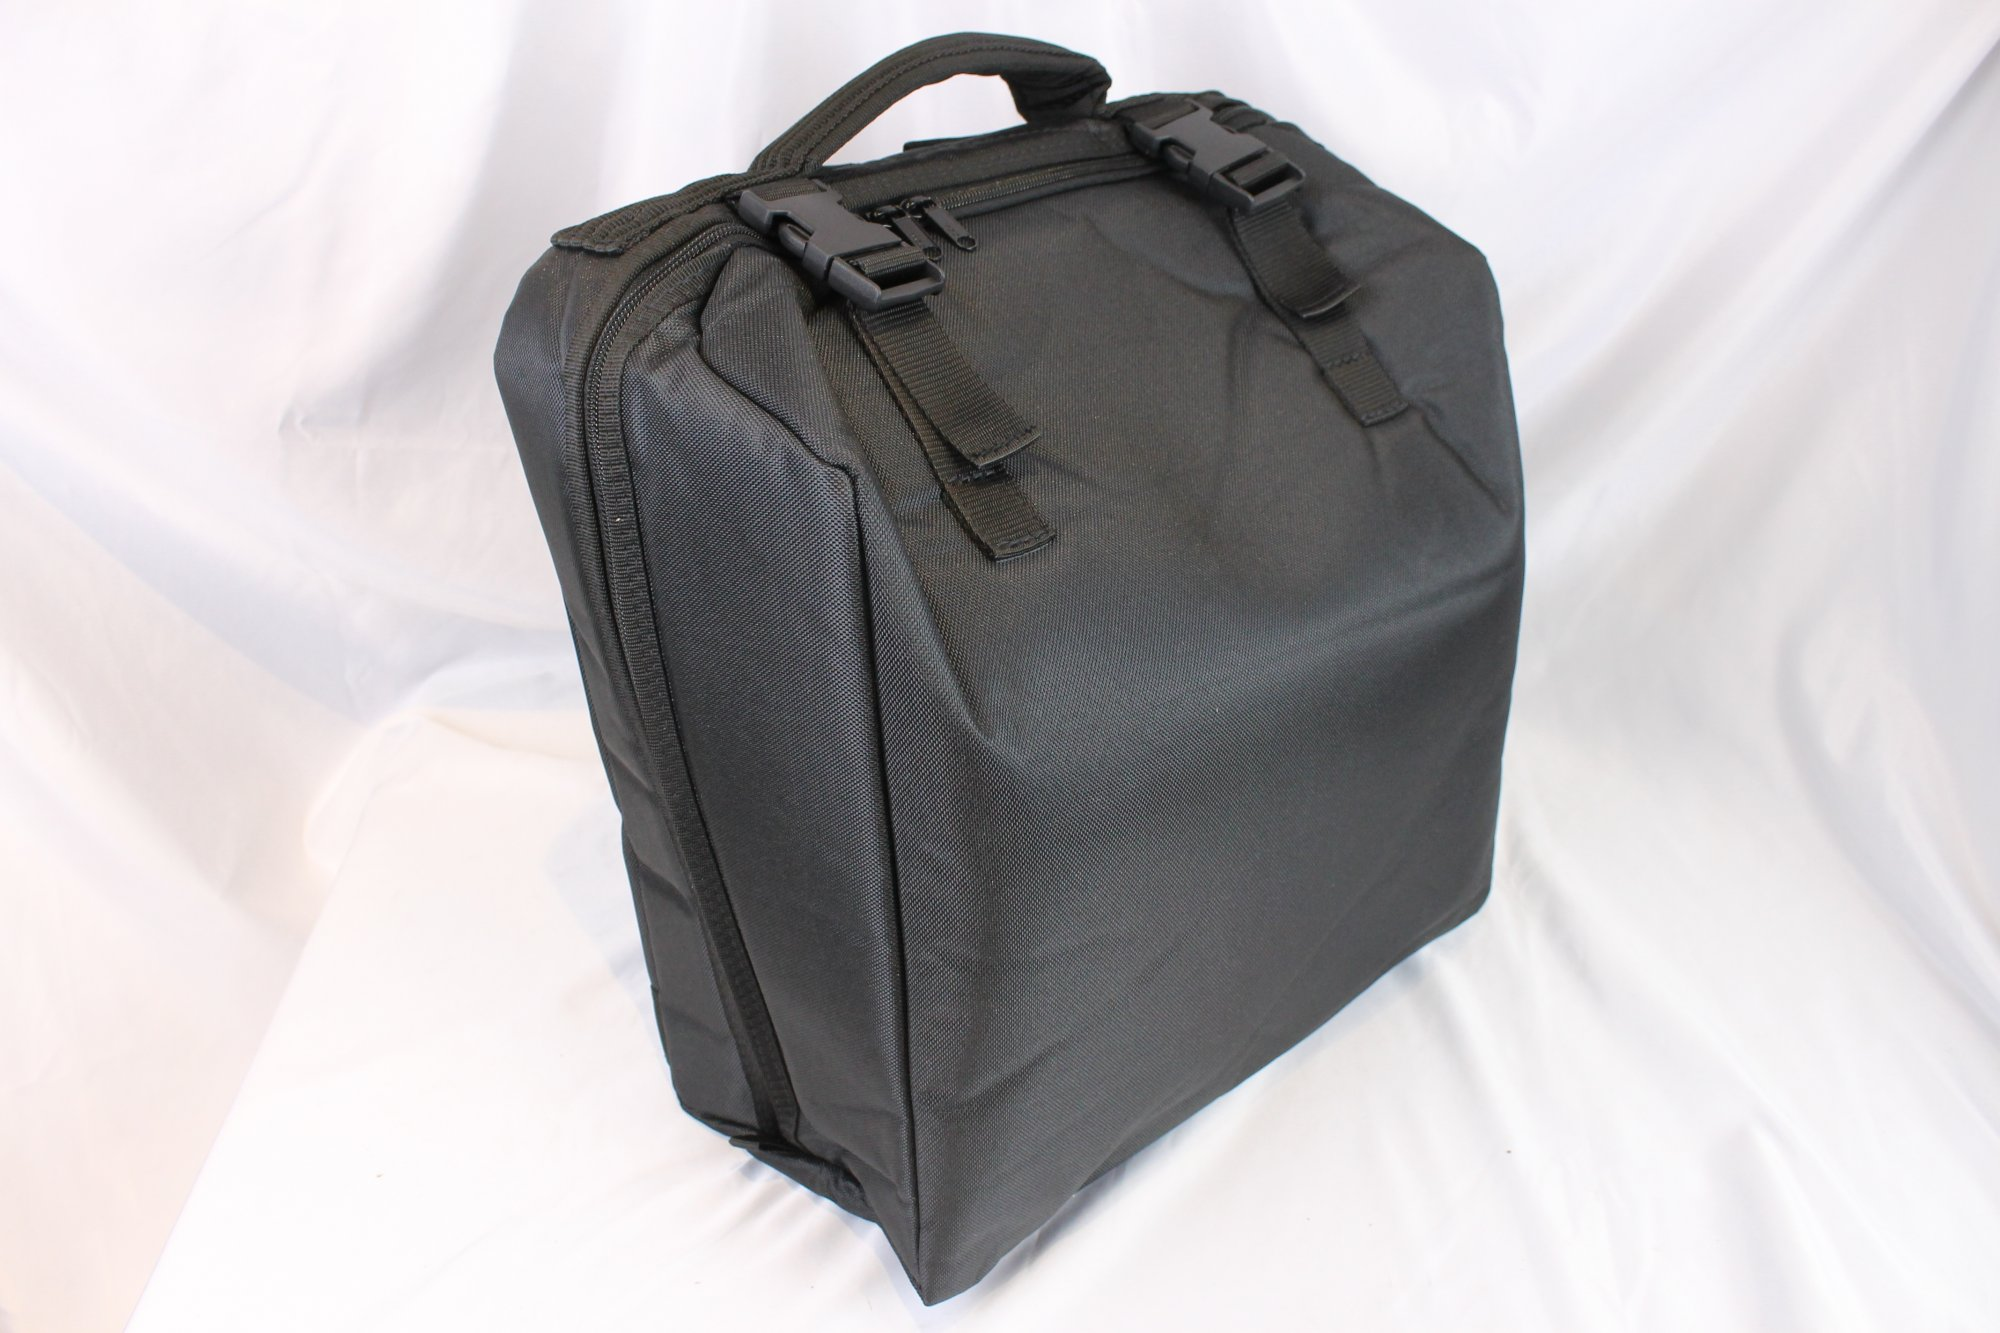 NEW Black Fuselli Gig Bag for Accordion 14 x 16 x 7